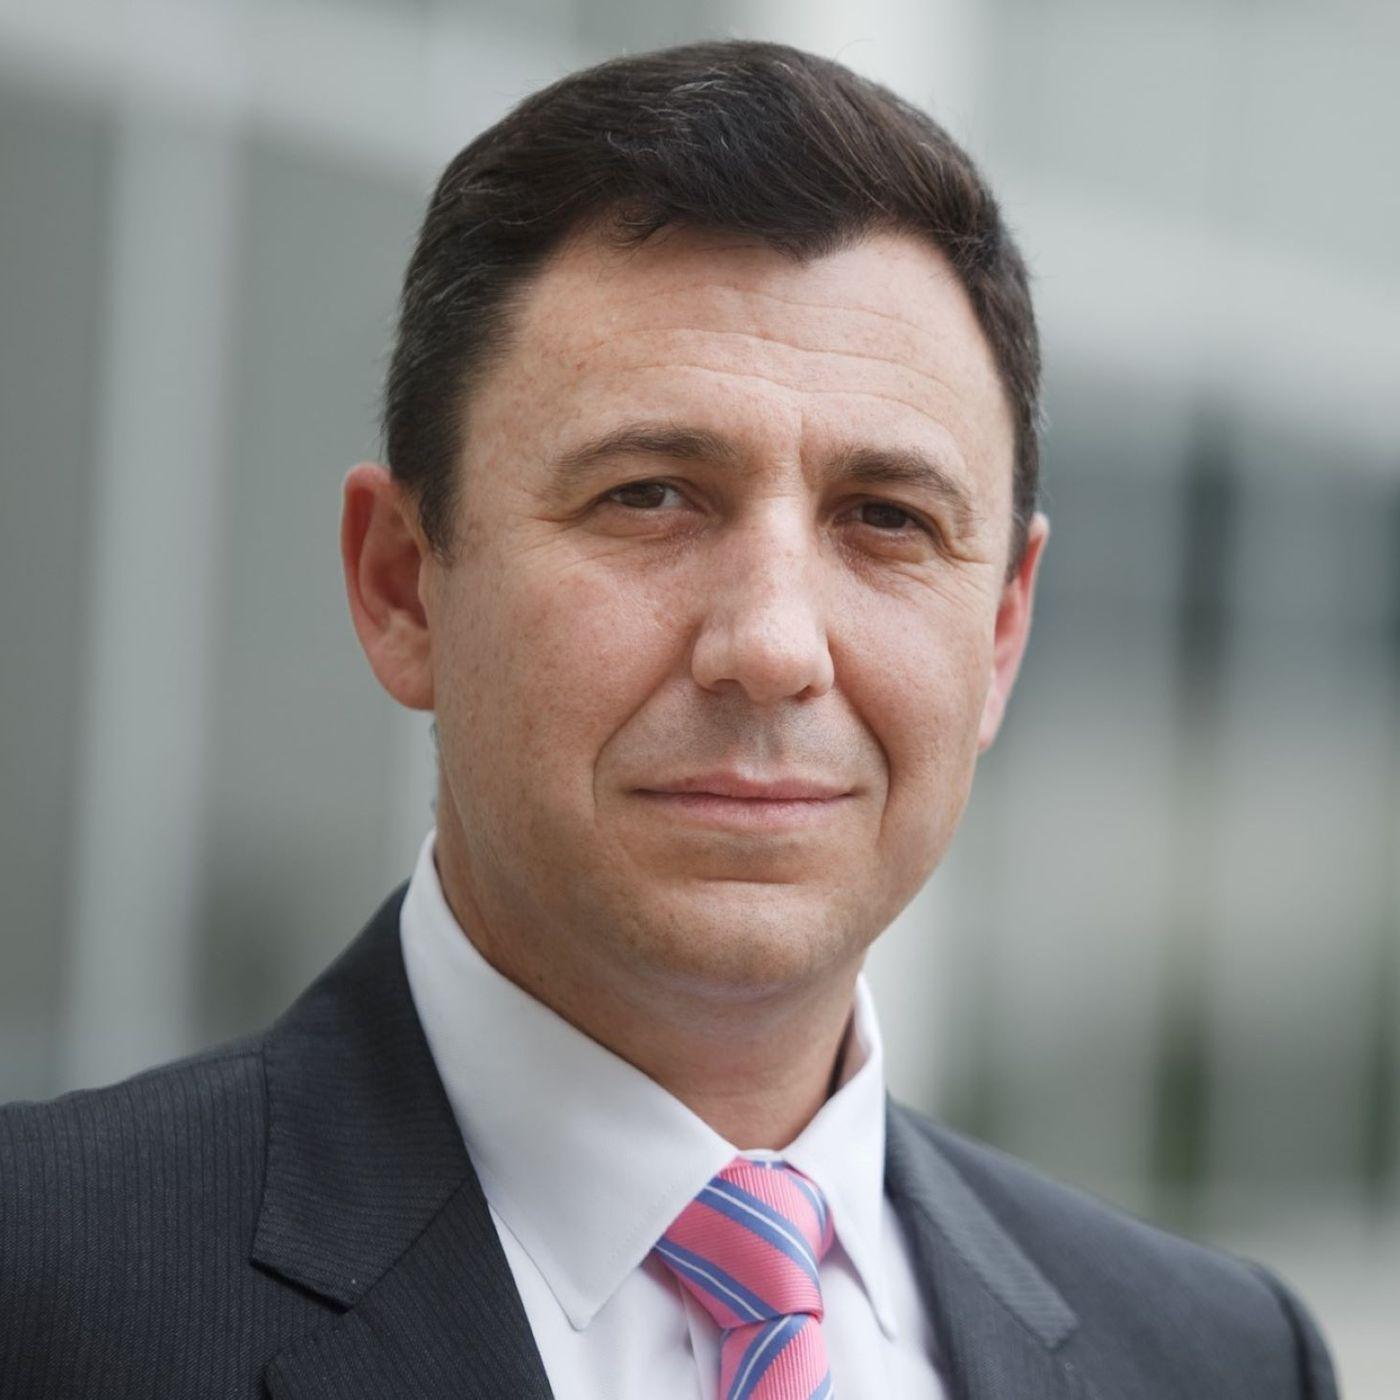 Brazil Business 2025, Alex Foessel, Automation, Autonomy, John Deere.